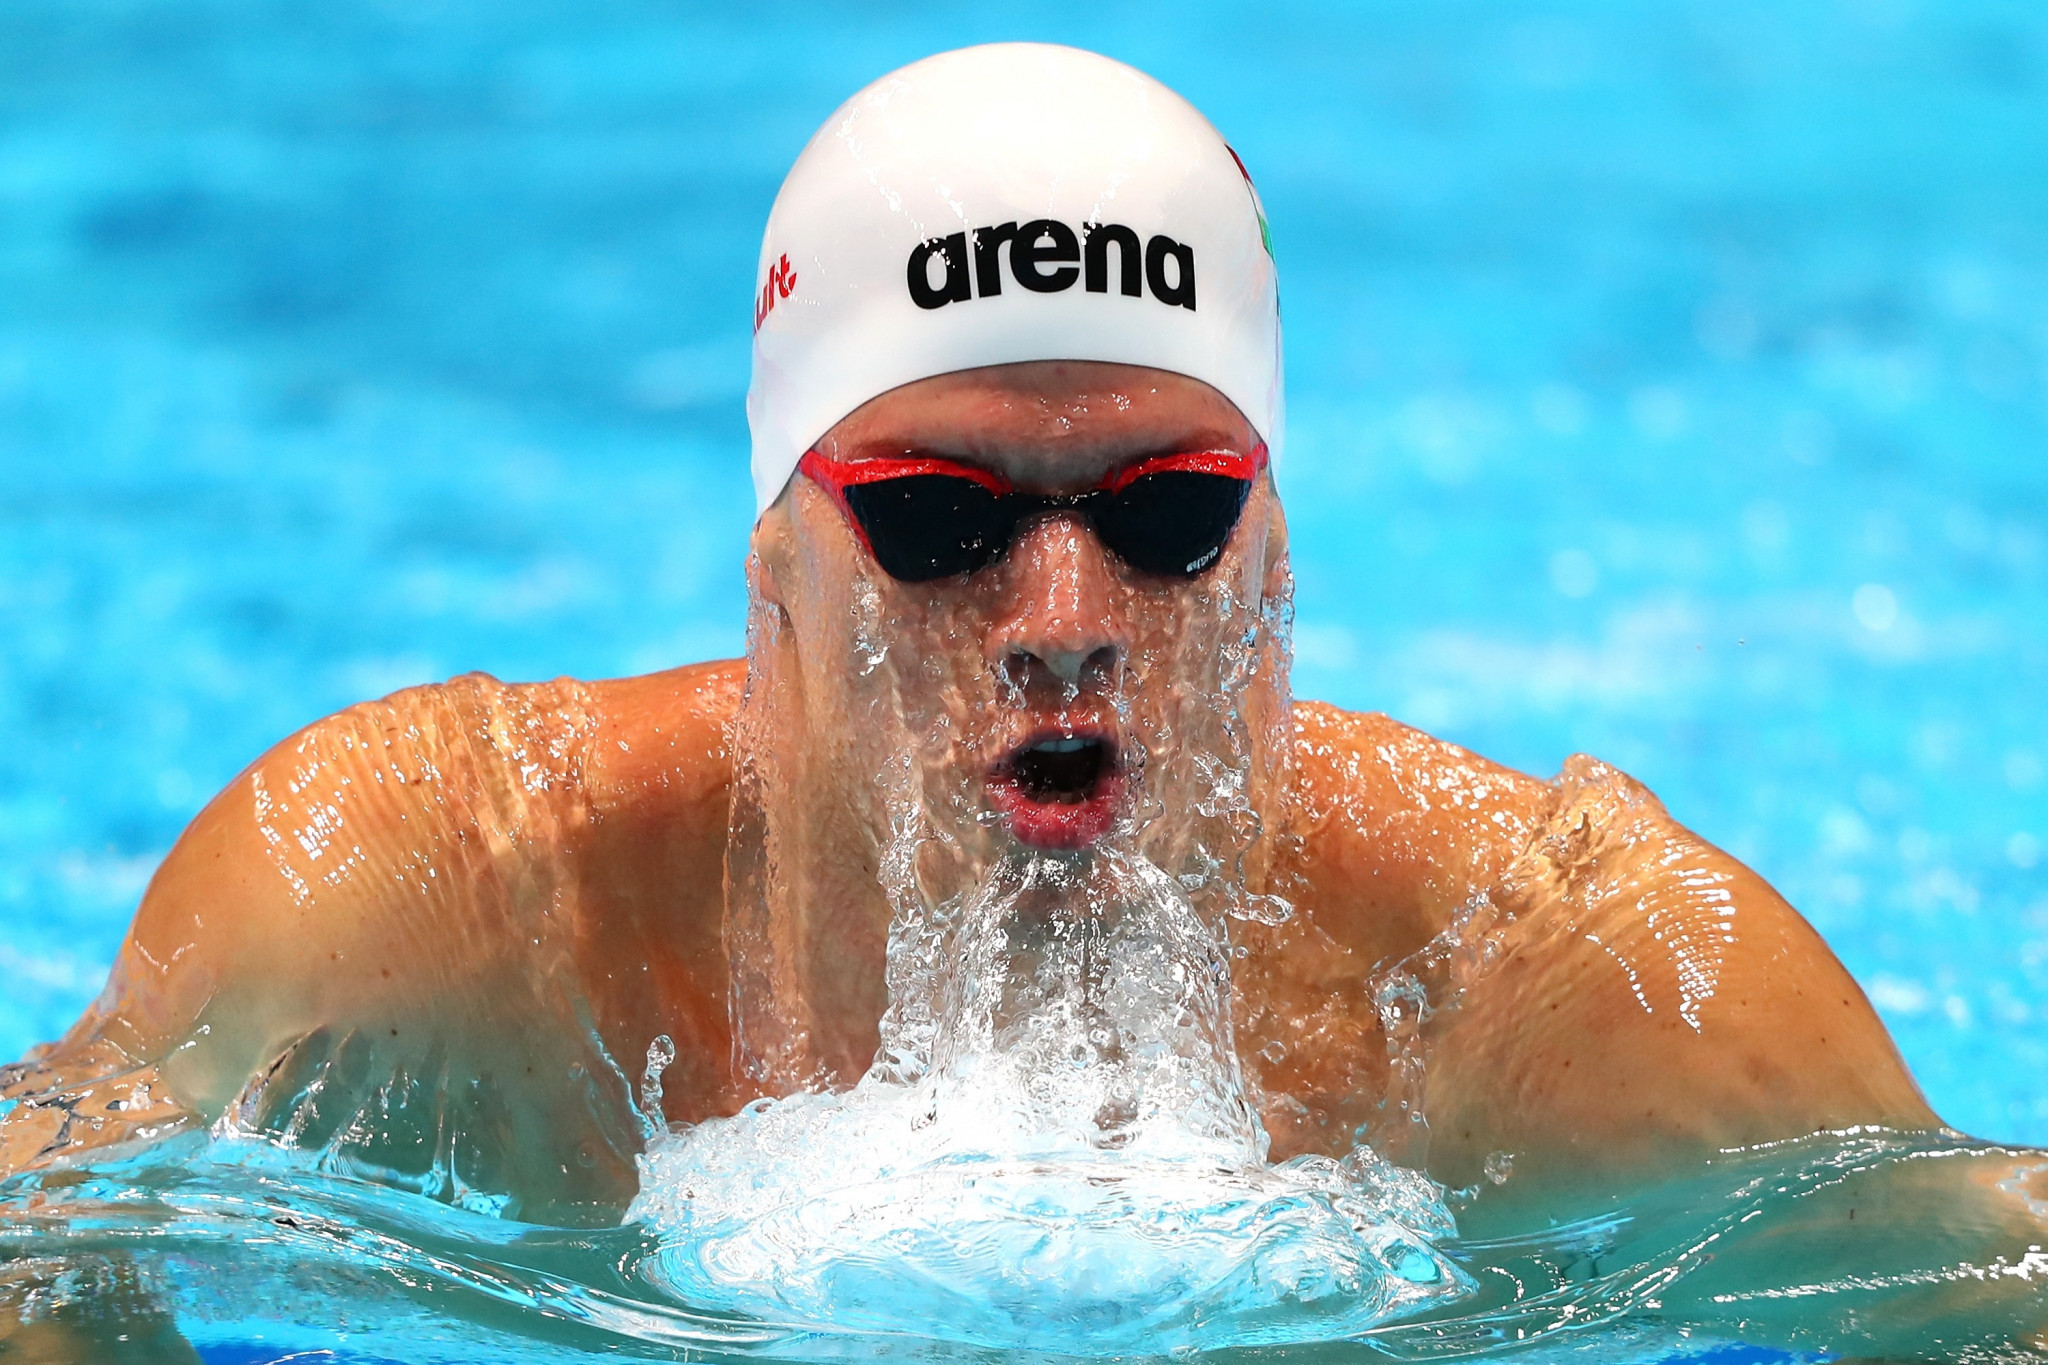 Hungary's Olympic gold medal-winning swimmer Gyurta retires aged 28